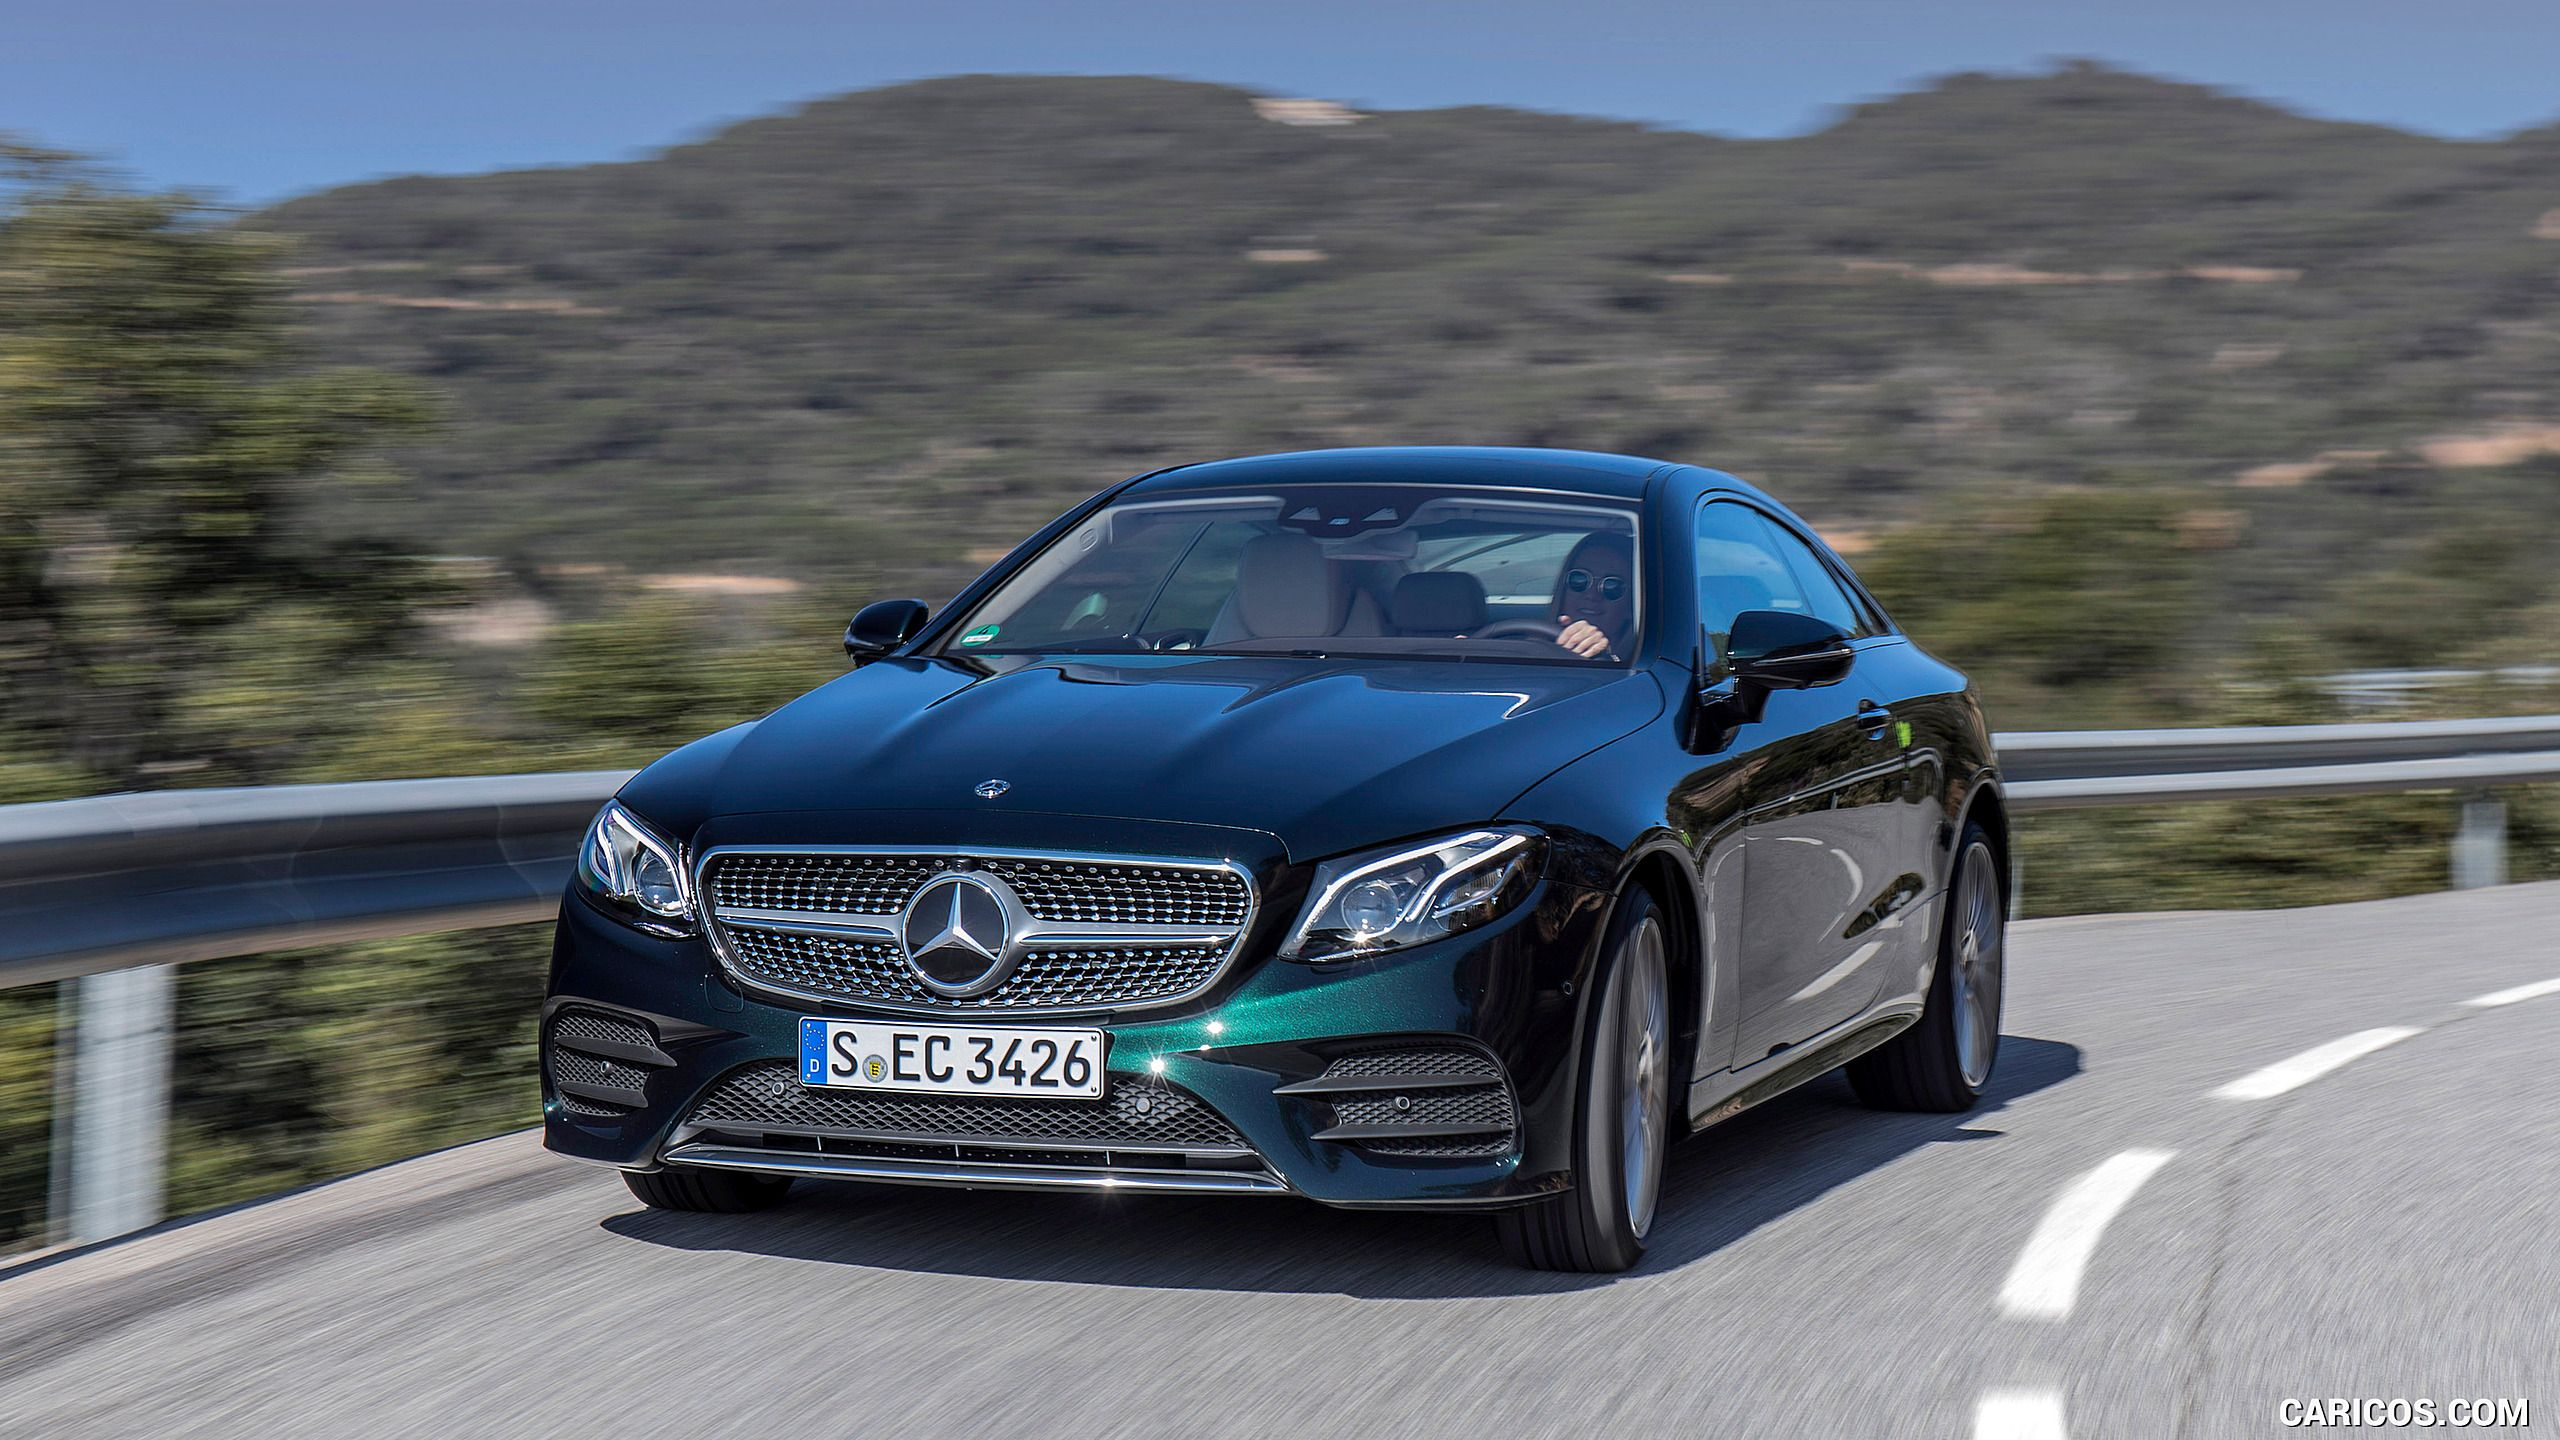 My E Clas >> 2018 Mercedes Benz E Class Coupe Wallpaper Cars Mercedes Car